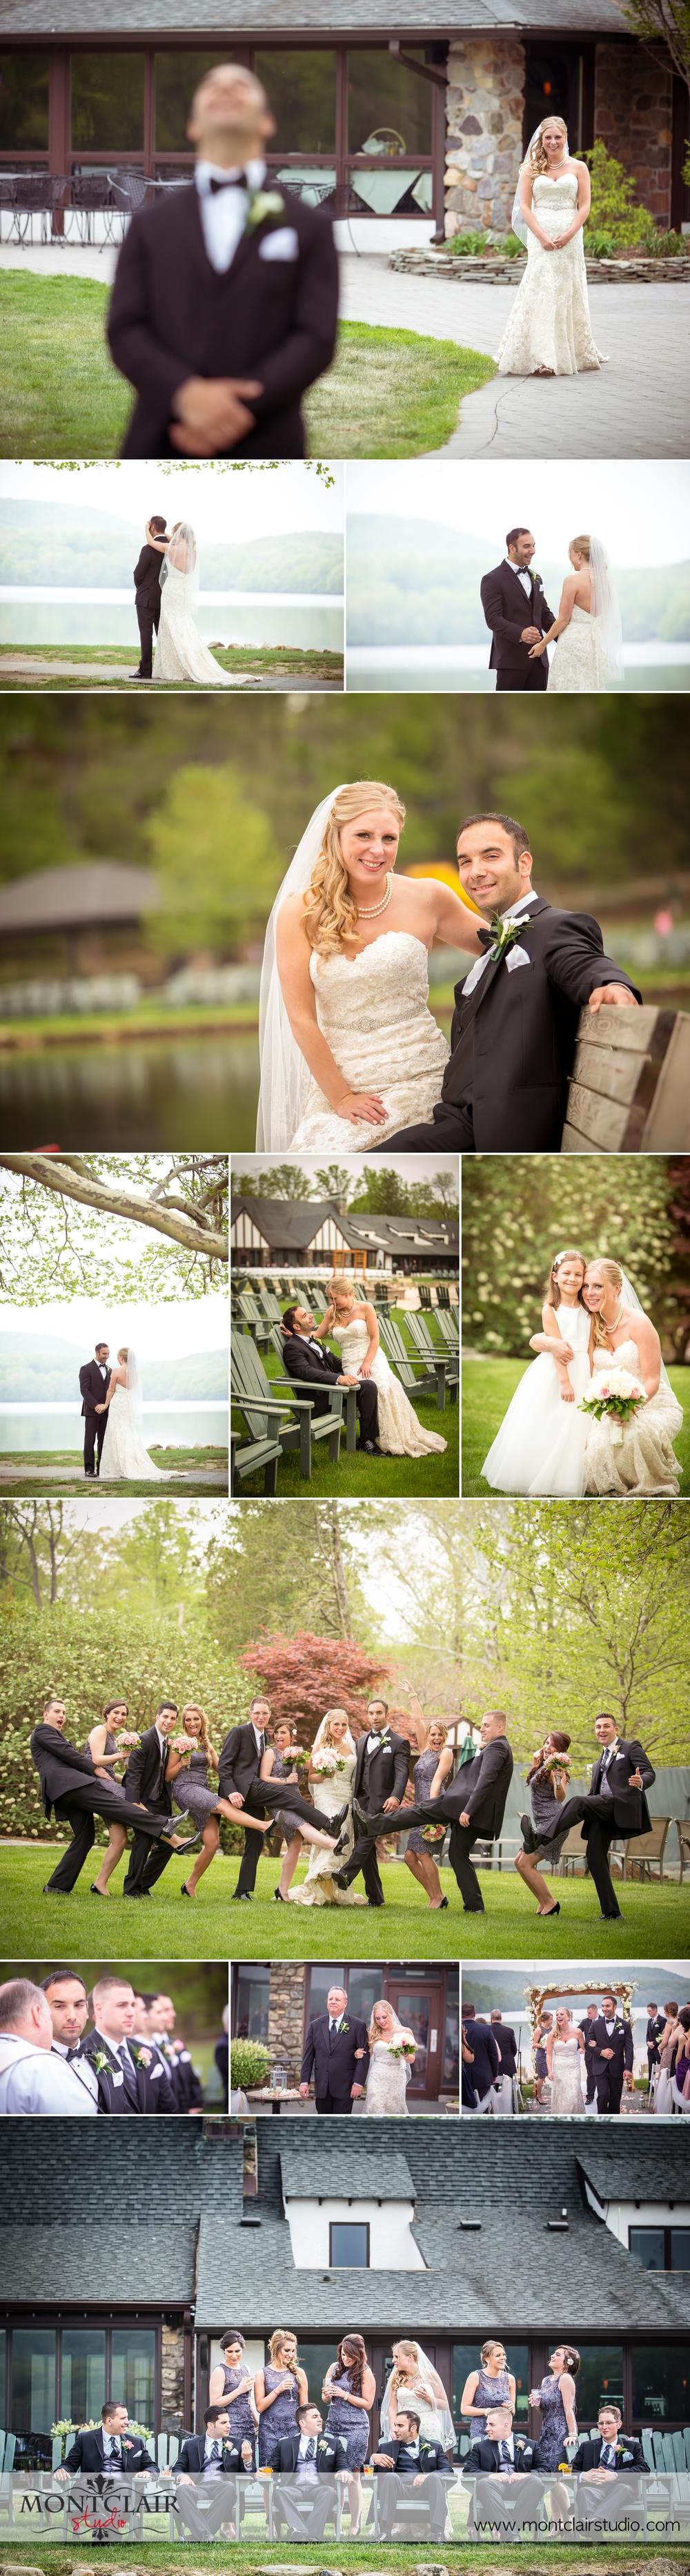 Alexandra And Michael Wedding  2.jpg